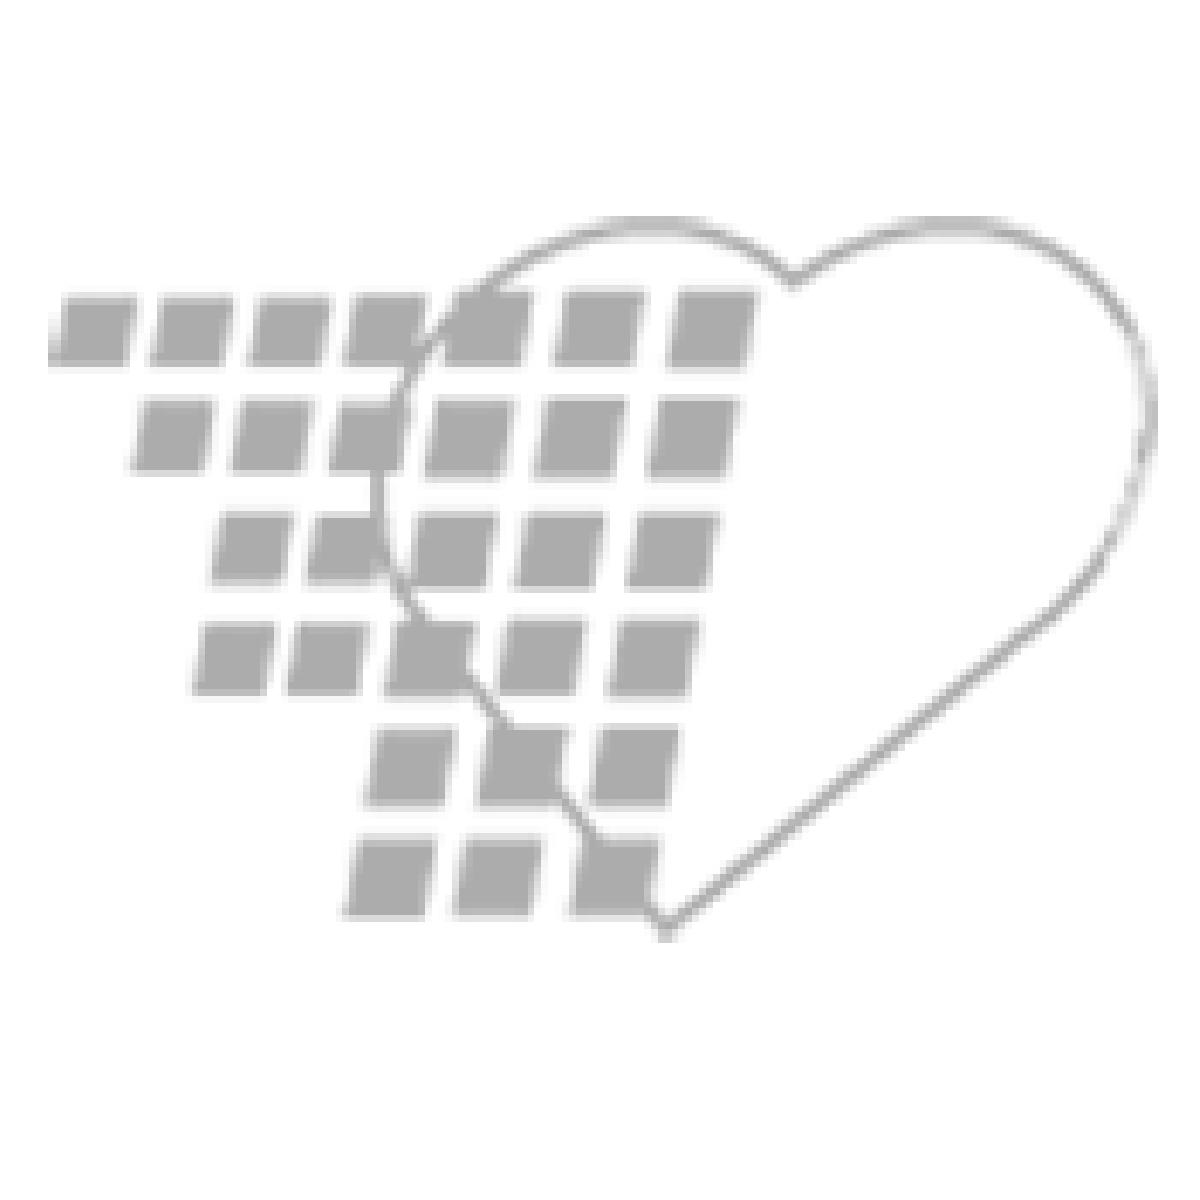 03-04-5457 PURELL™ Advanced Hand Sanitizer Aloe Gel 1200mL Refill for PURELL™ TFX™ Dispenser